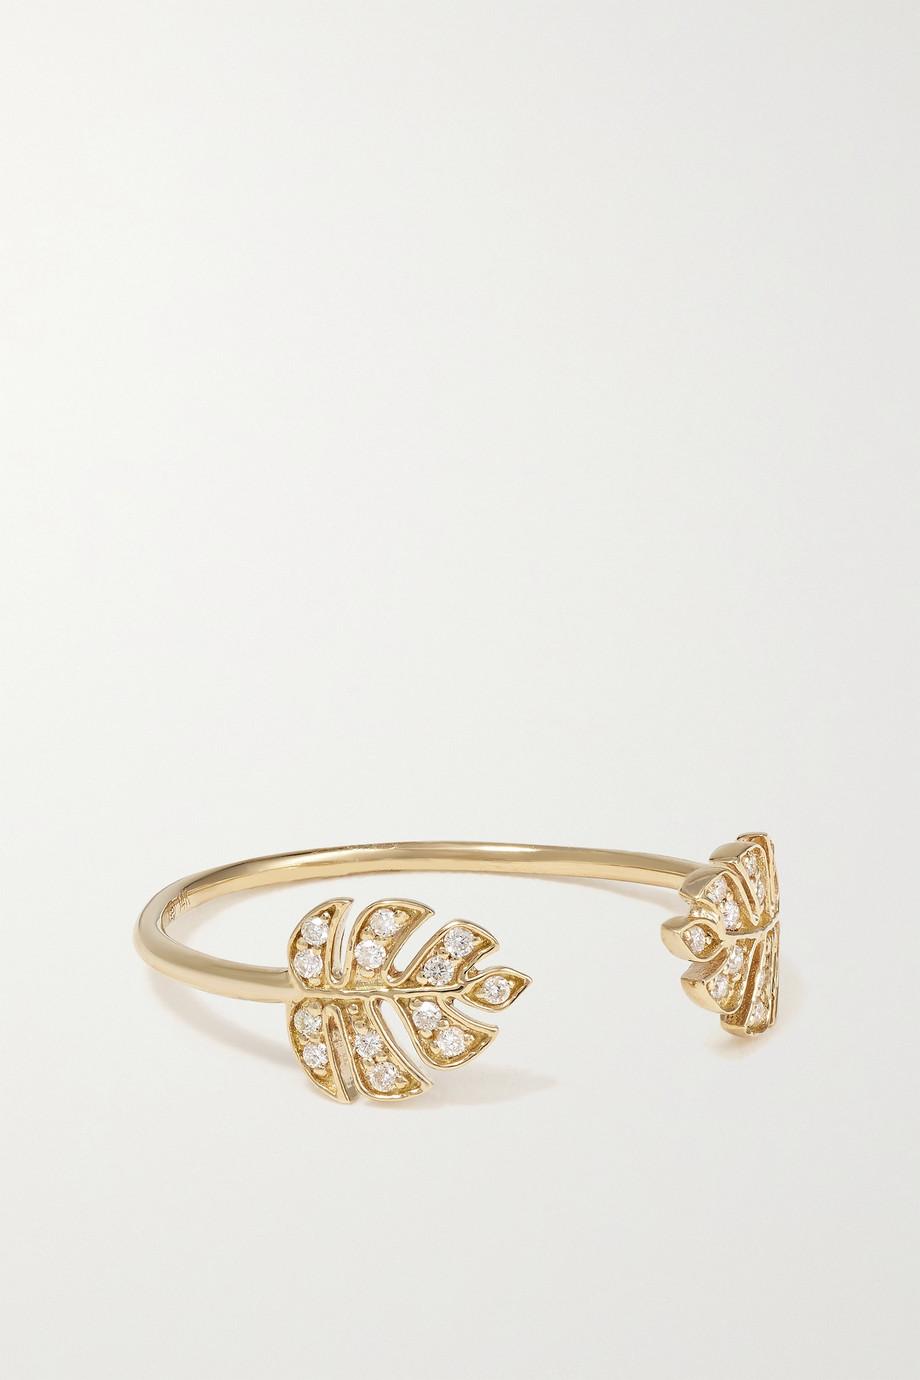 Sydney Evan Tiny Monstera Leaf 14-karat gold diamond ring